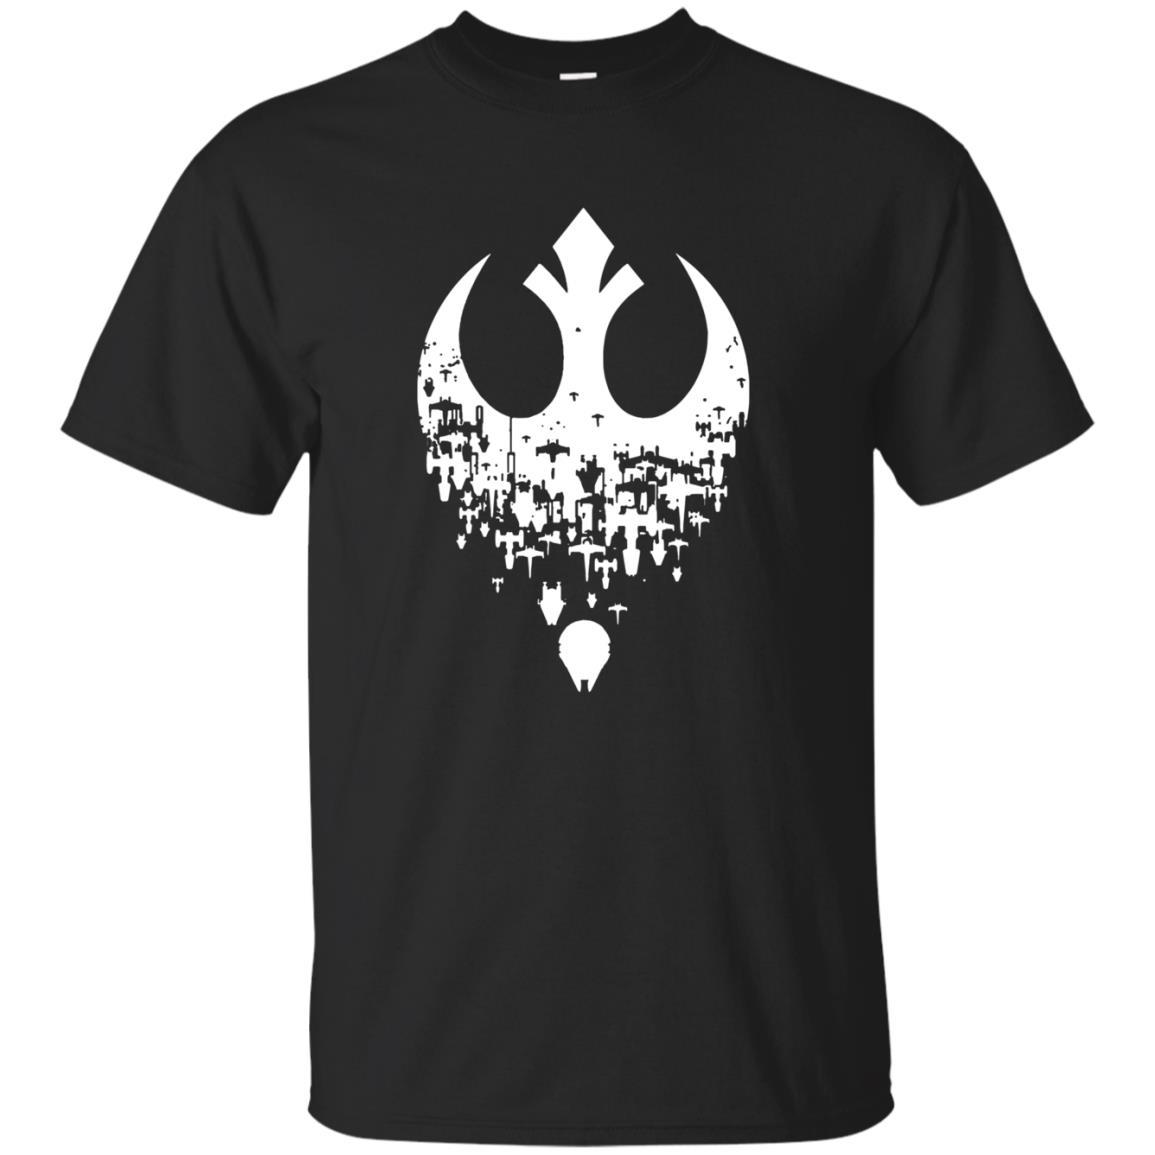 image 1499 - Star Wars Fractured Rebellion shirt, hoodie, tank